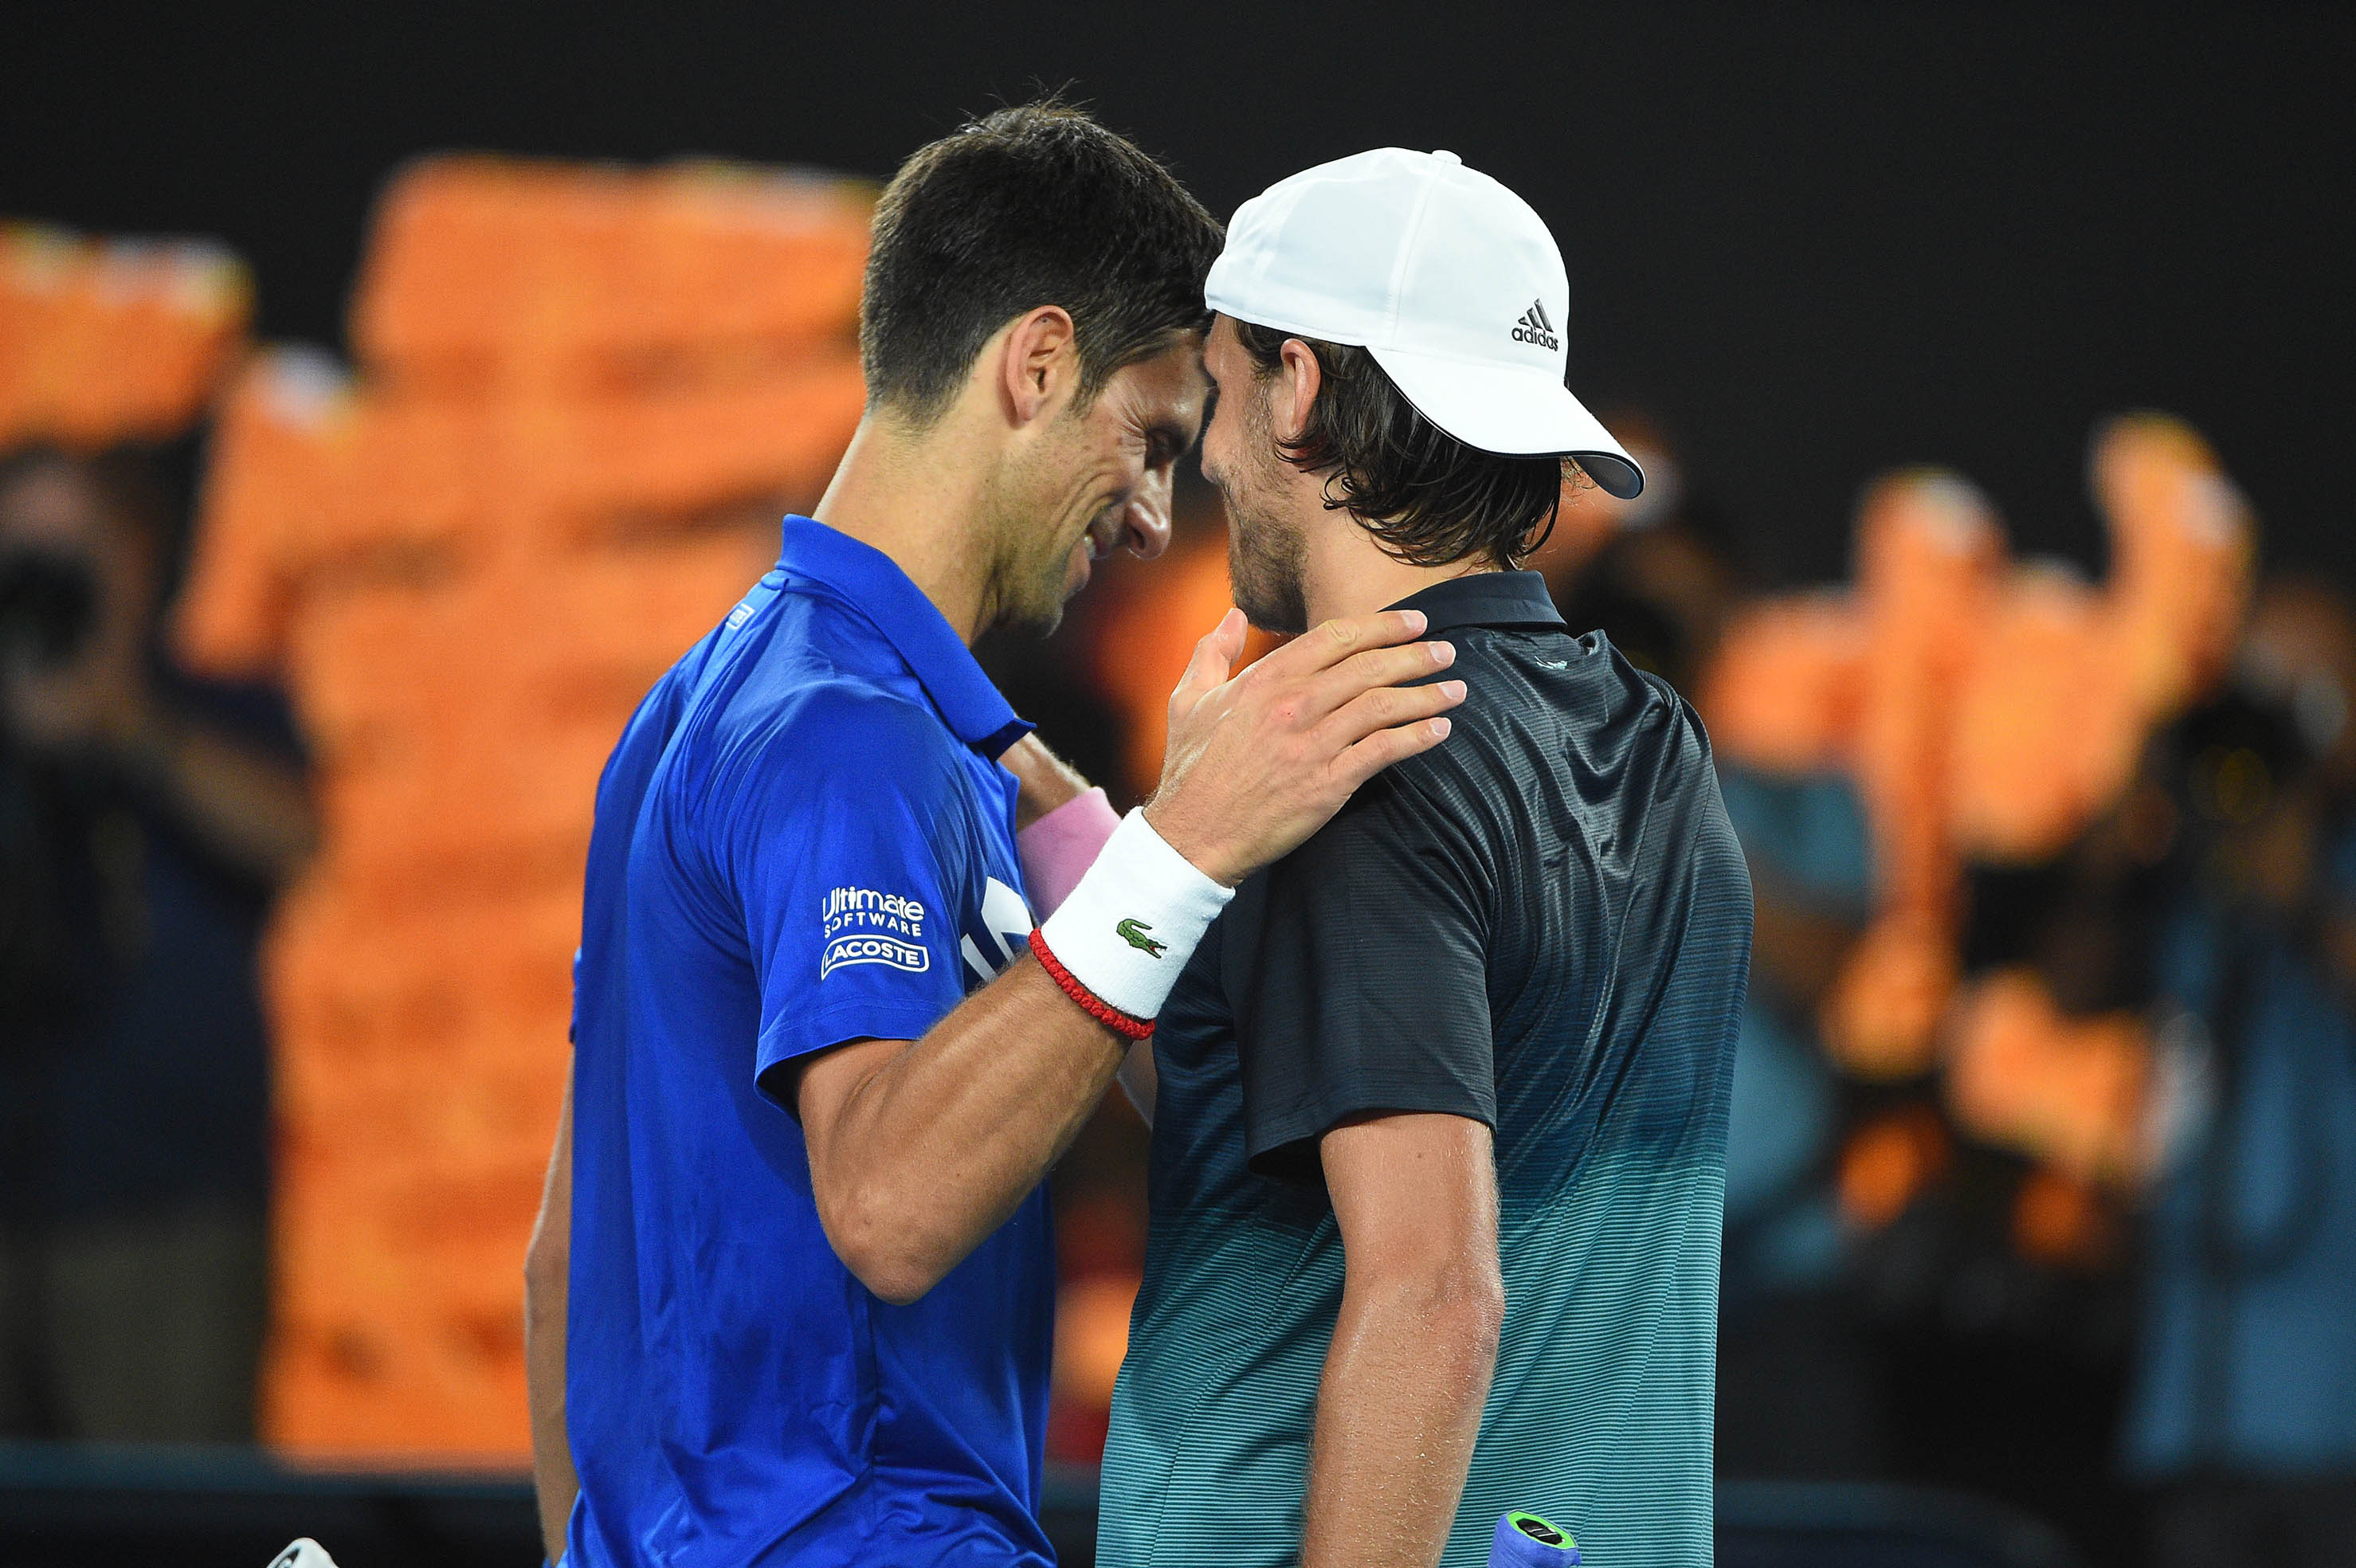 Novak Djokovic and Lucas Pouille at the net during 2019 Australian Open